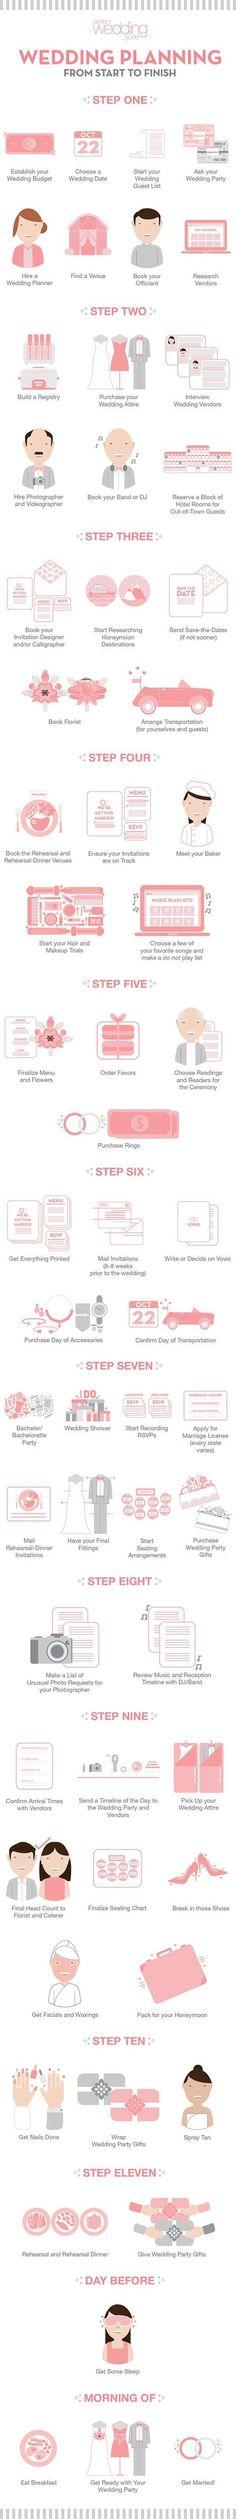 Infographic: Wedding Planning Timeline #weddingring